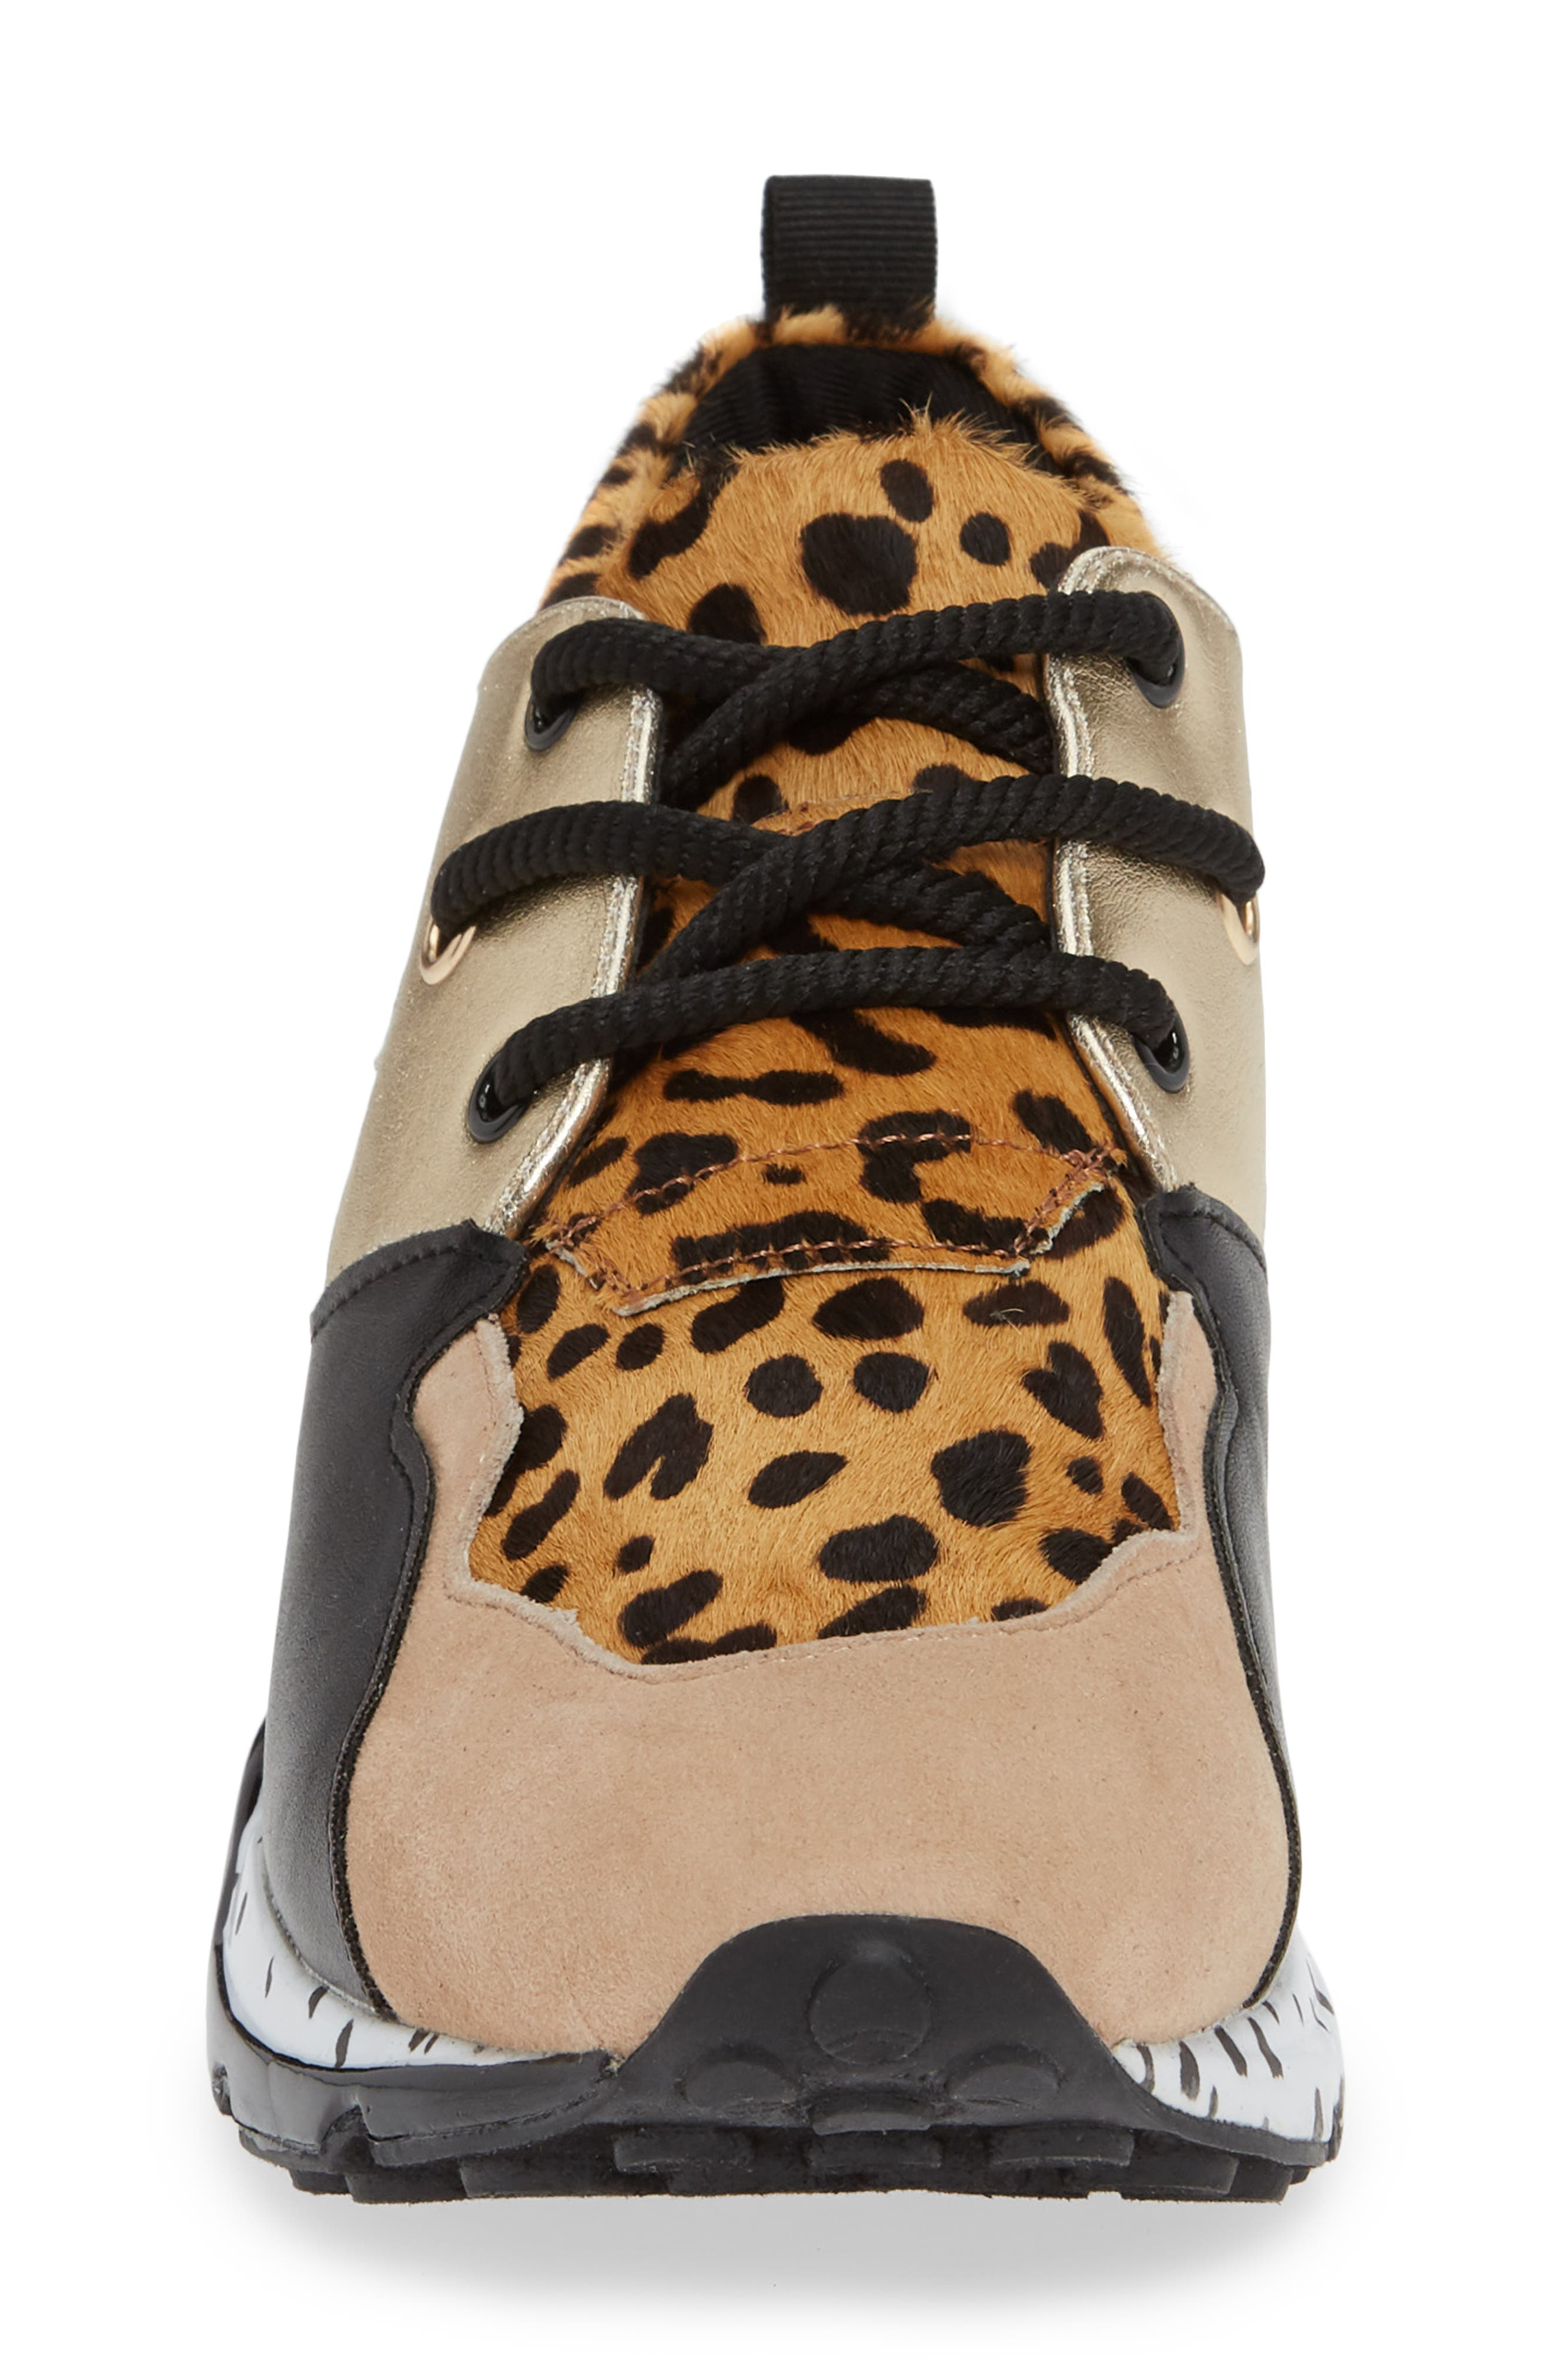 Cliff Genuine Calf Hair Sneaker,                             Alternate thumbnail 4, color,                             ANIMAL PRINT CALF HAIR